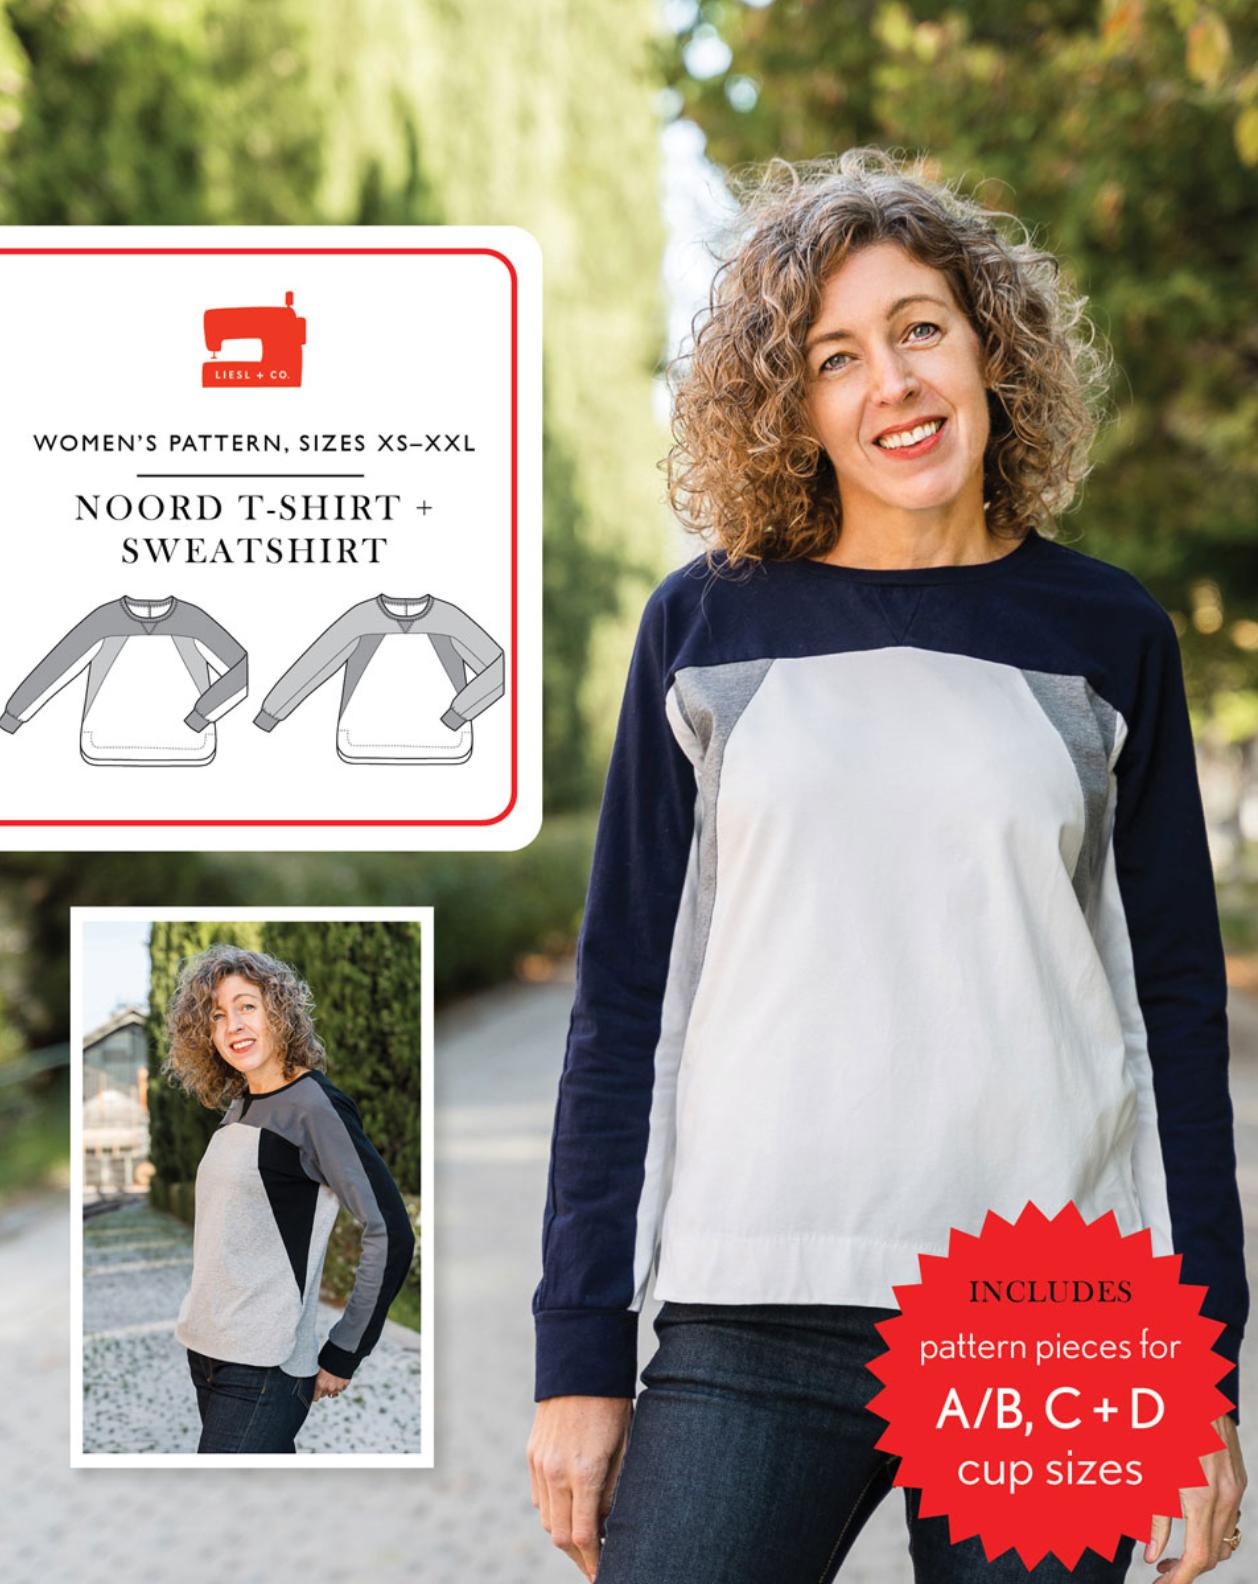 Noord Sweatshirt and Tee - Liesl & Co.